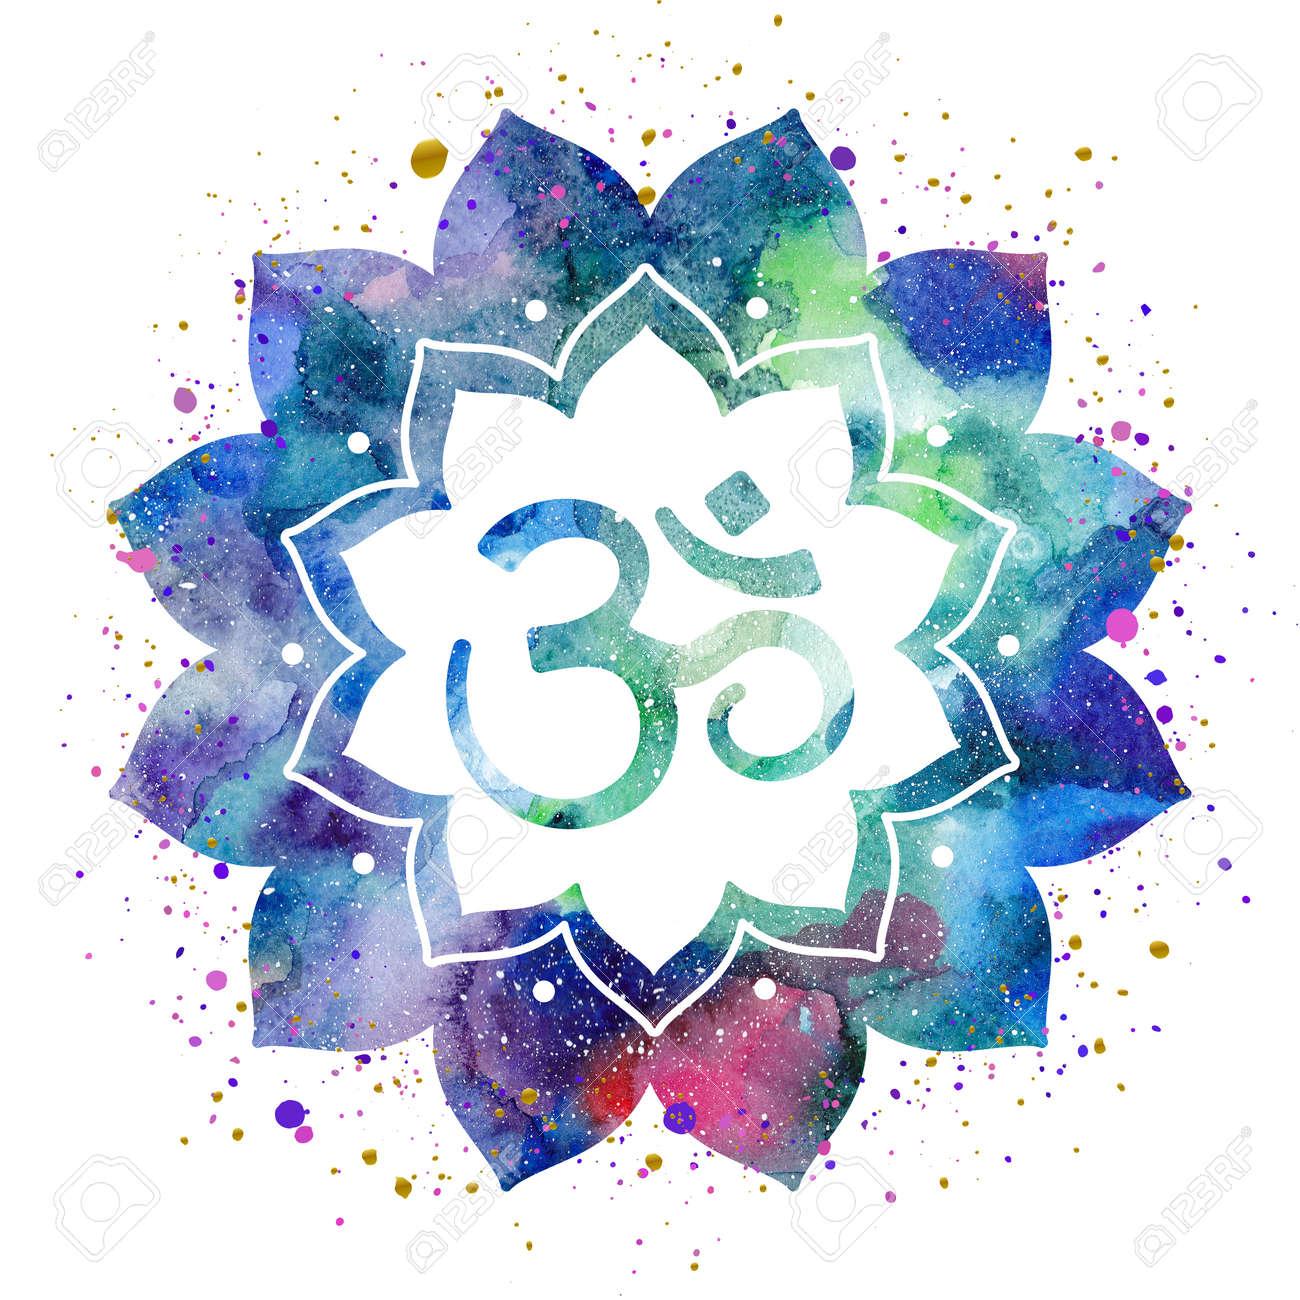 Om sign in lotus flower rainbow watercolor texture and splash om sign in lotus flower rainbow watercolor texture and splash isolated spiritual buddhist buycottarizona Gallery